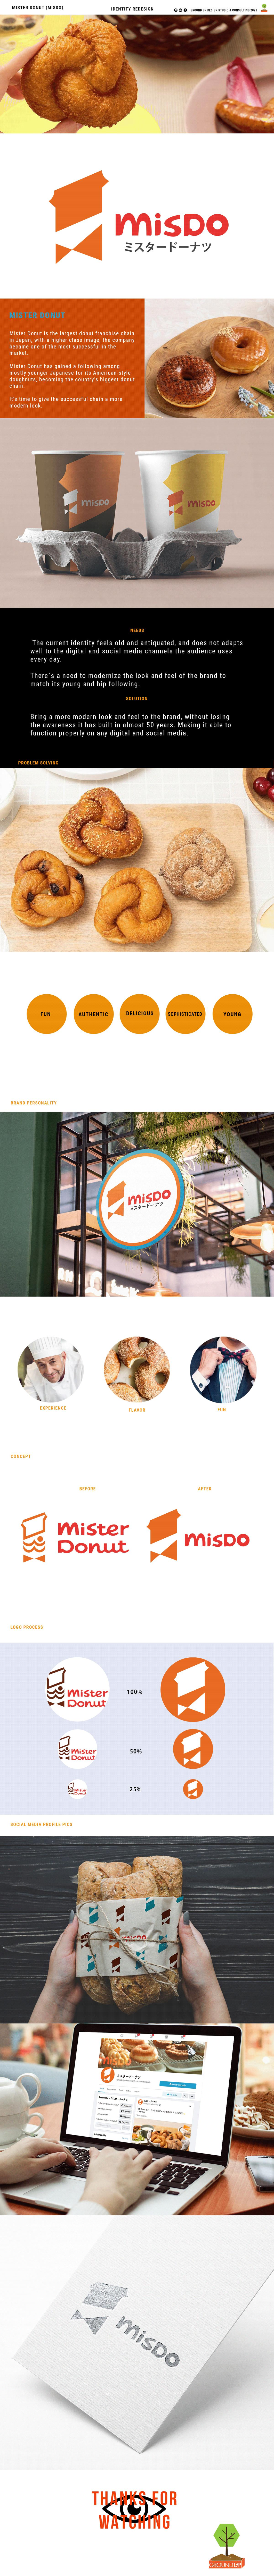 chain donut identity japan logo Mister redesign restaurant tokyo